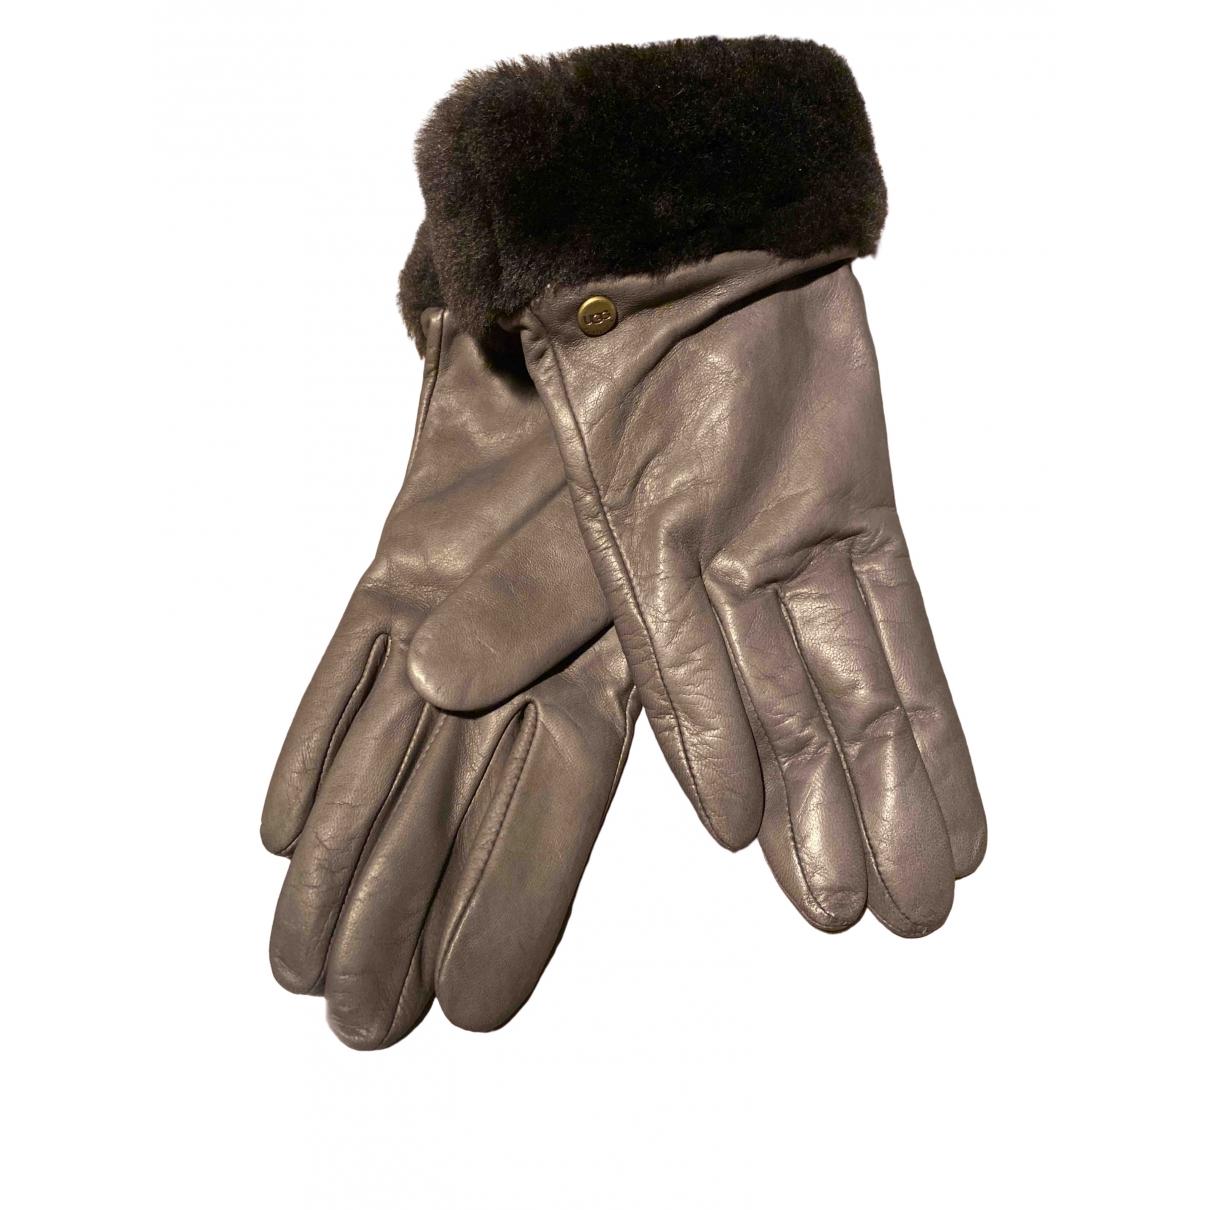 Ugg N Brown Leather Gloves for Women M International